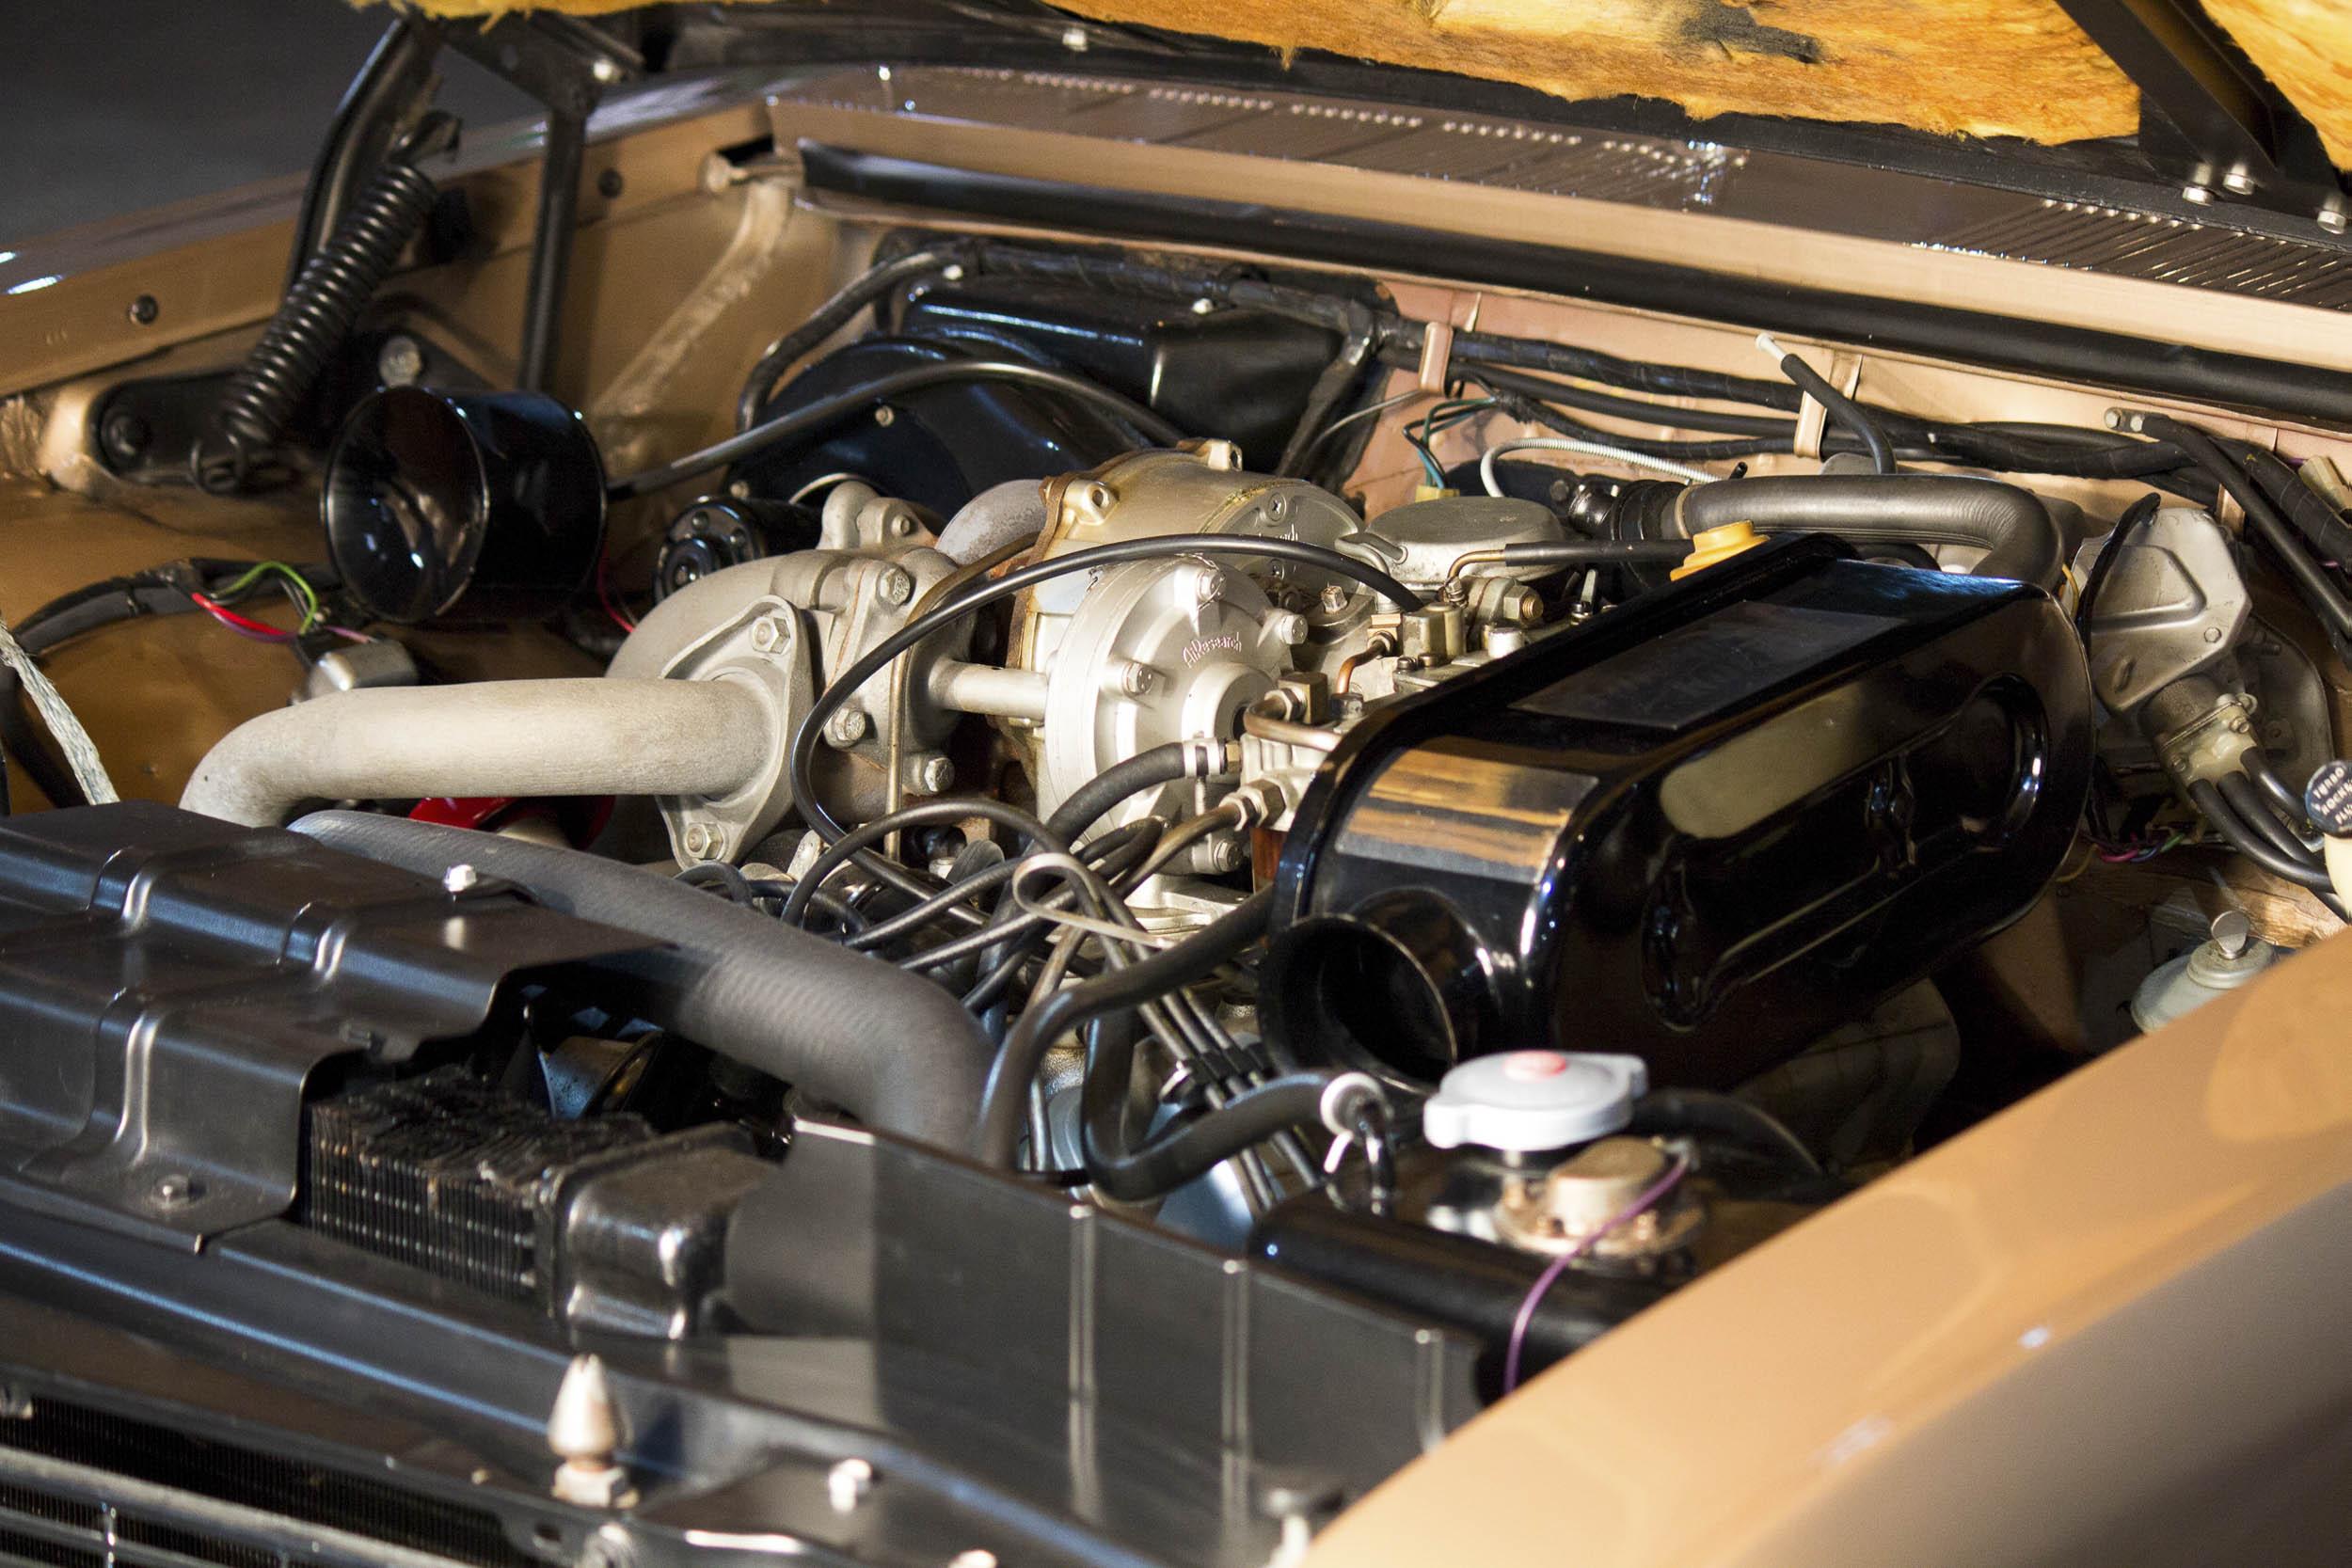 Specially designed single sidedraft carburetor and turbocharger